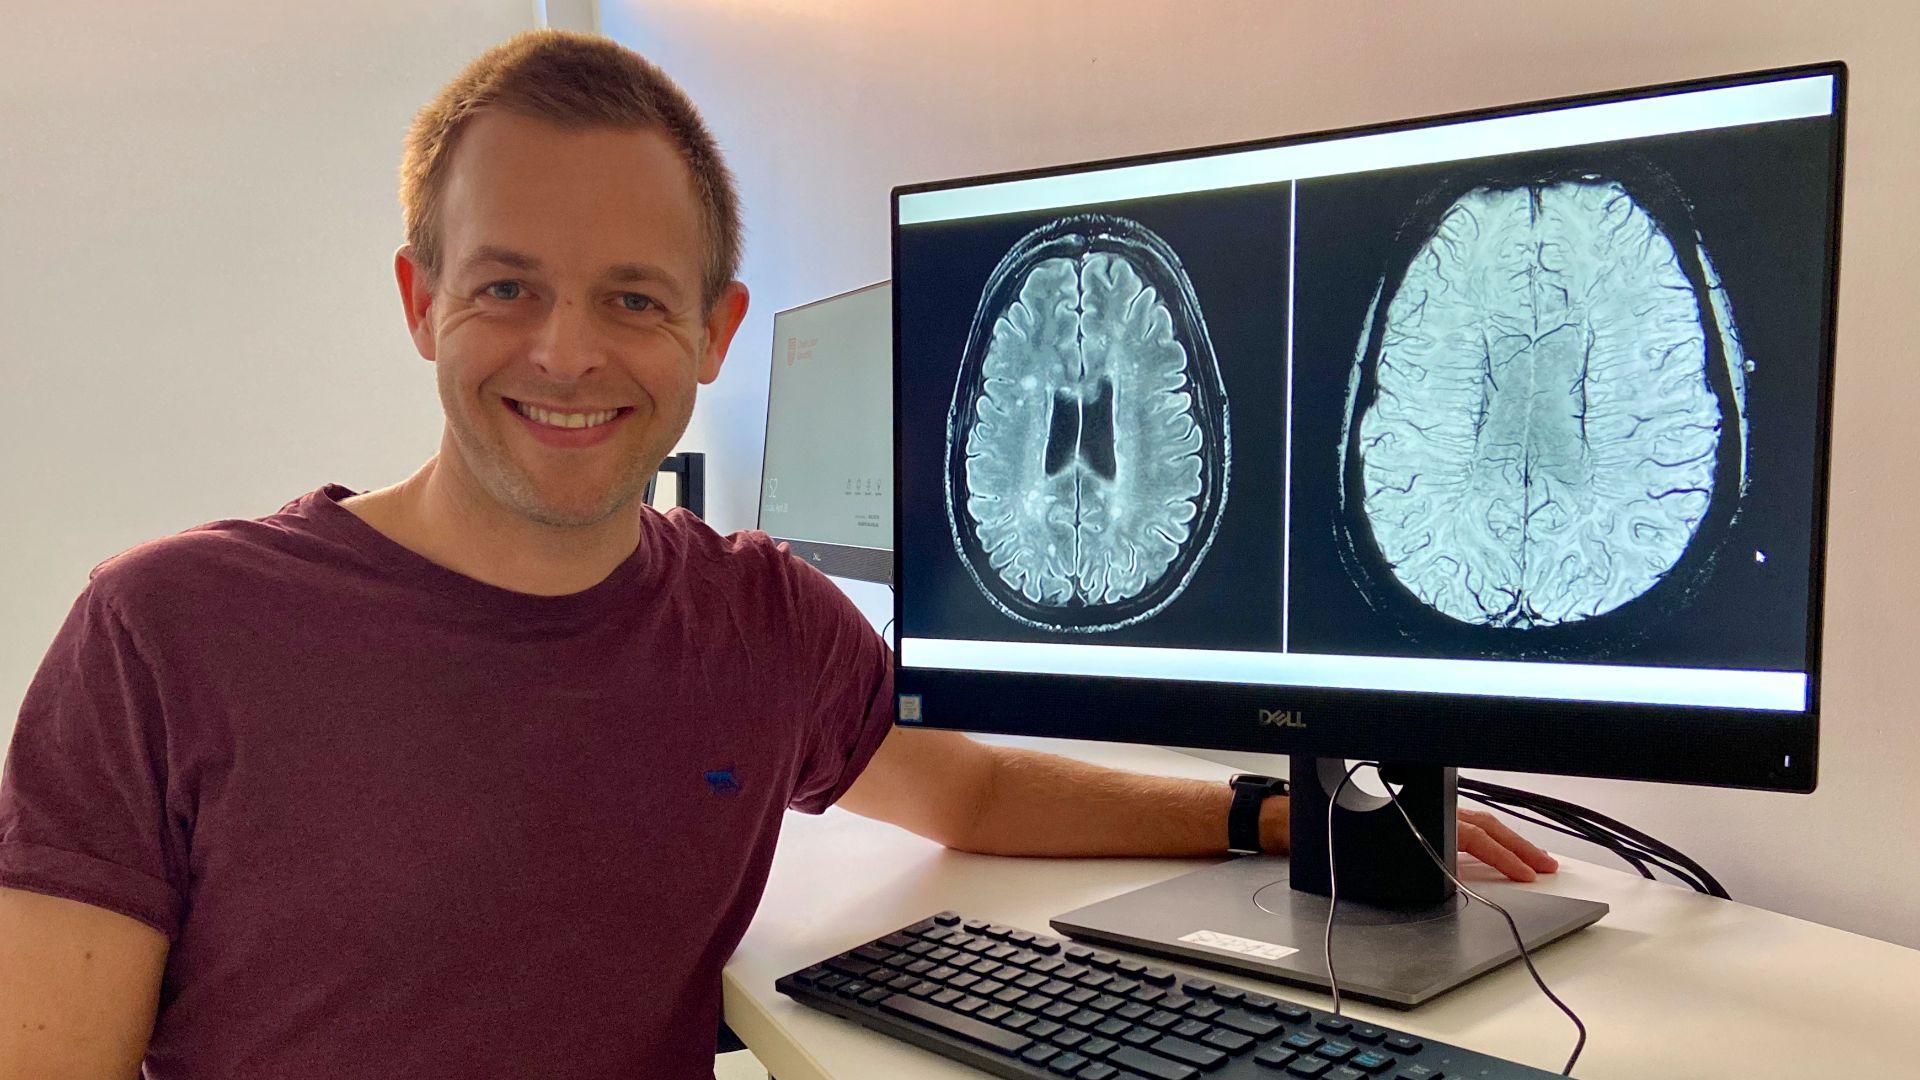 Riverina men needed for study on MRI distress